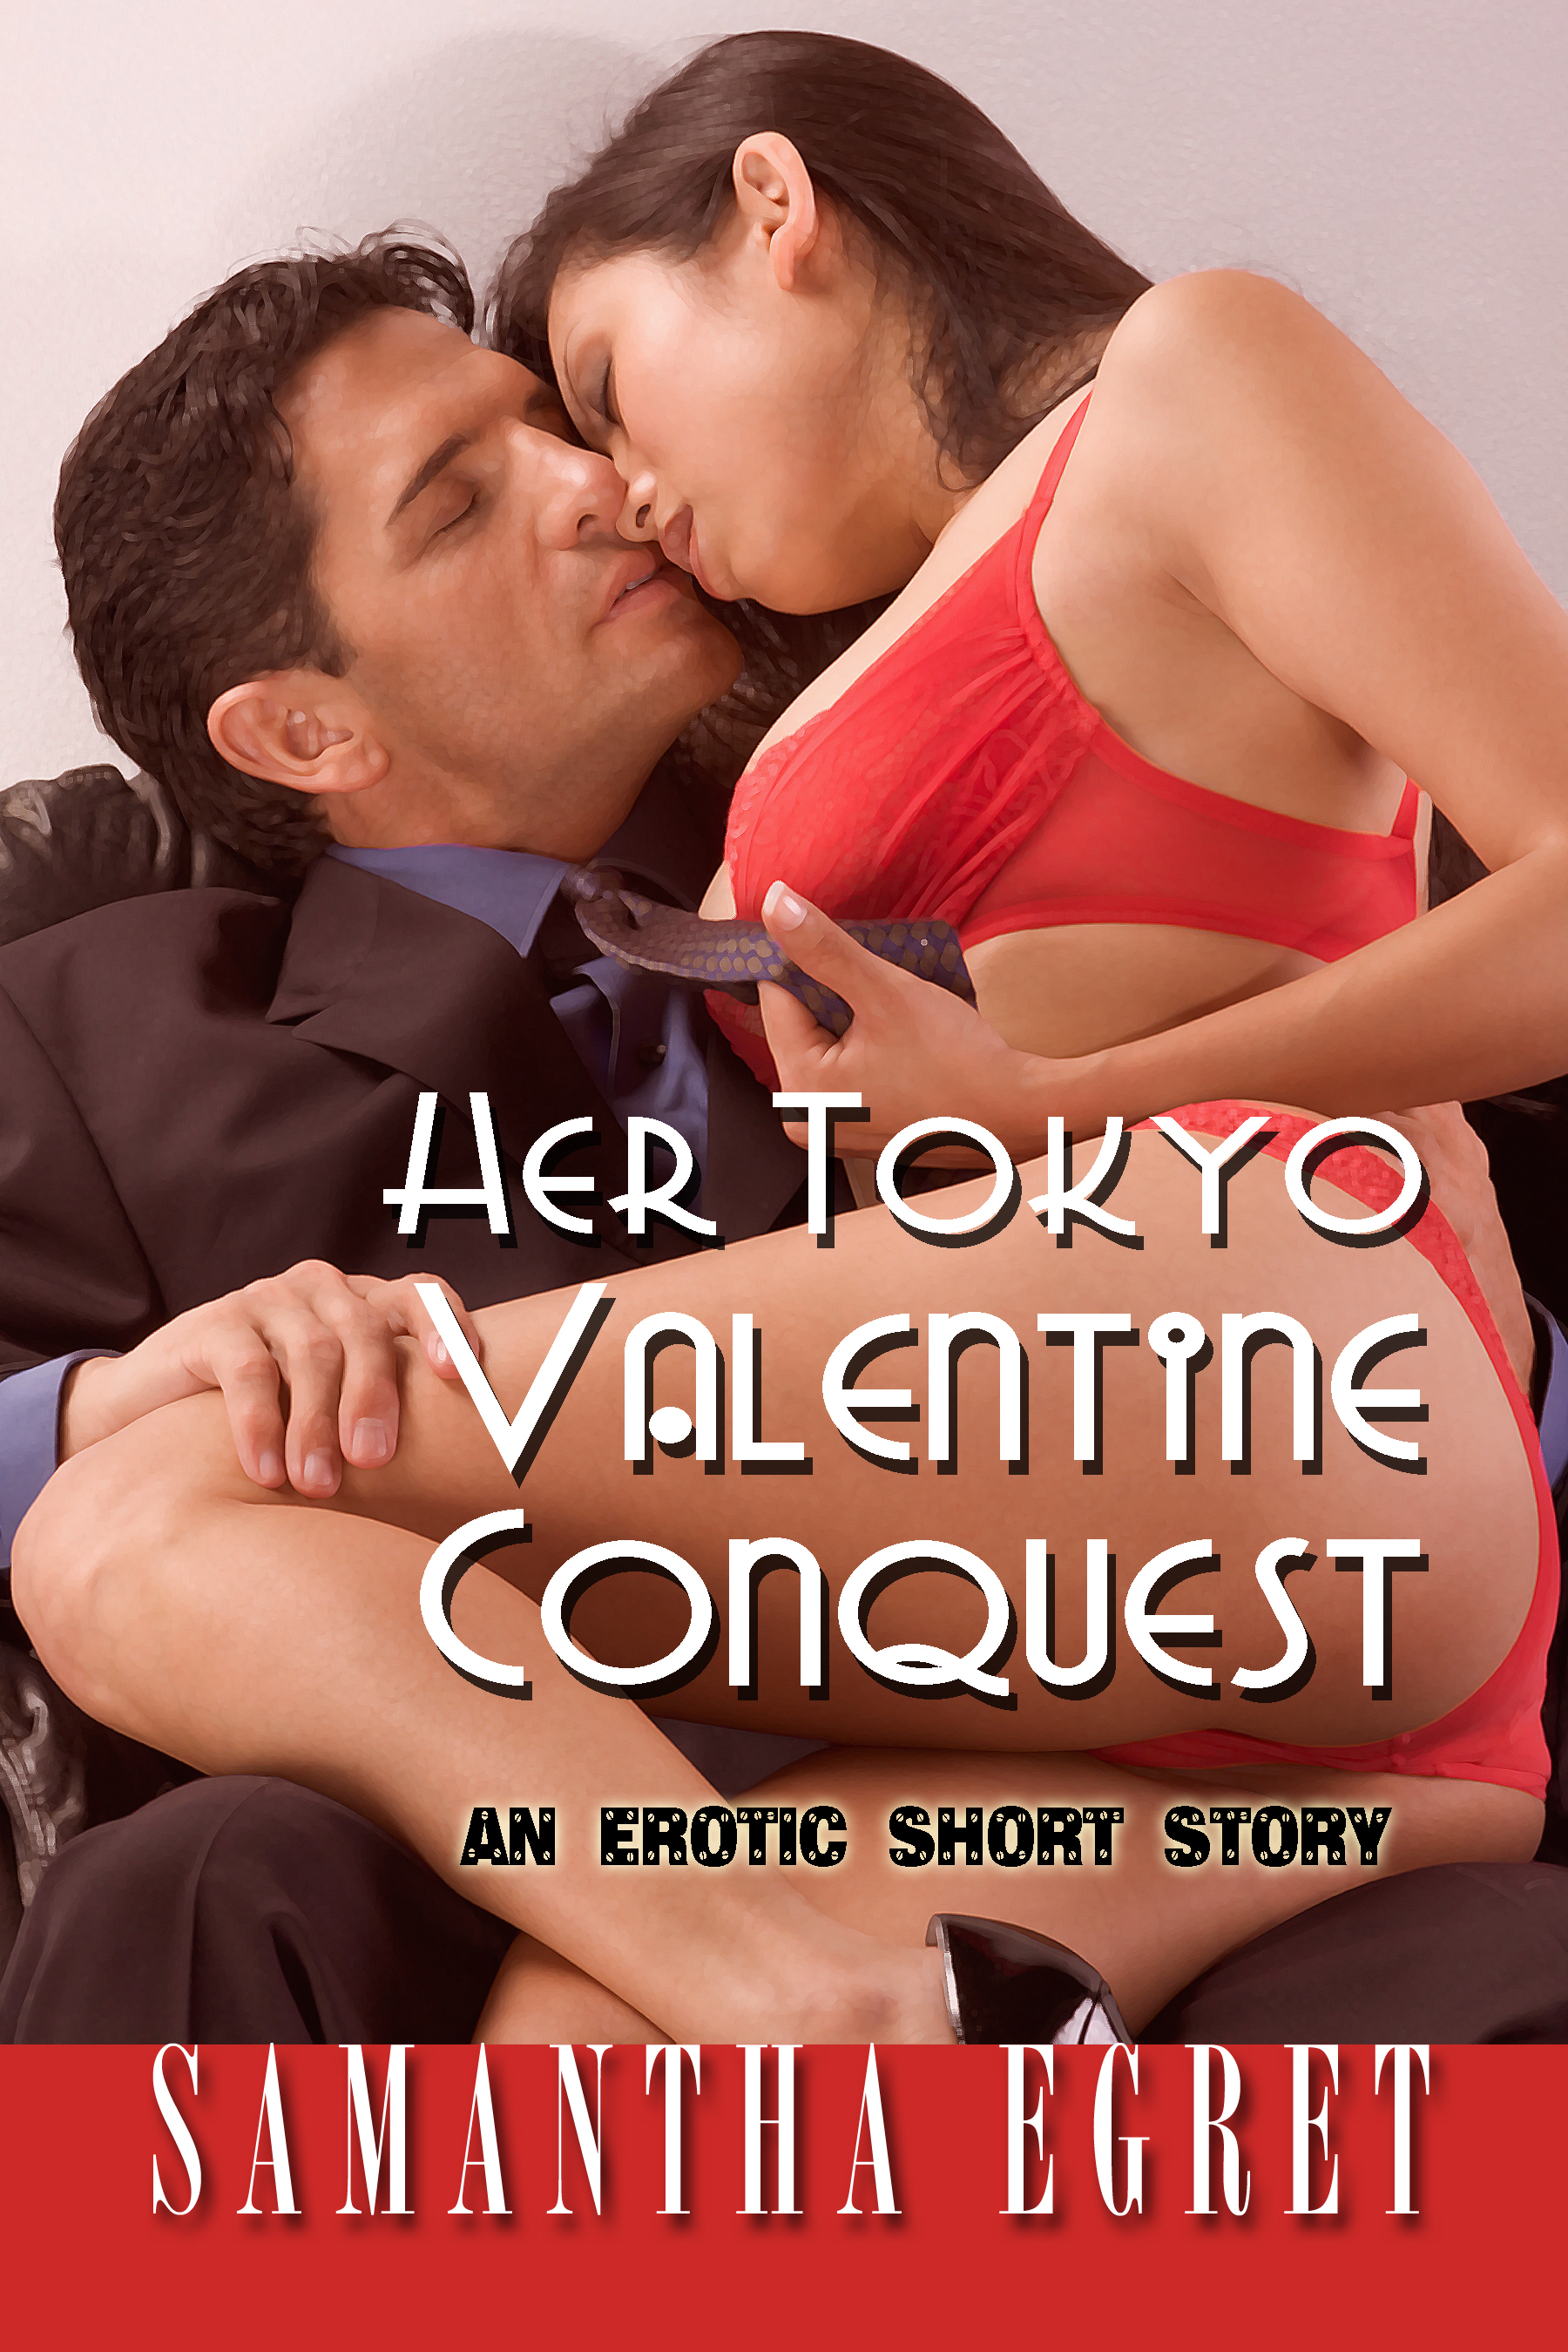 Her Tokyo Valentine Conquest: An Erotic Short Story Samantha Egret